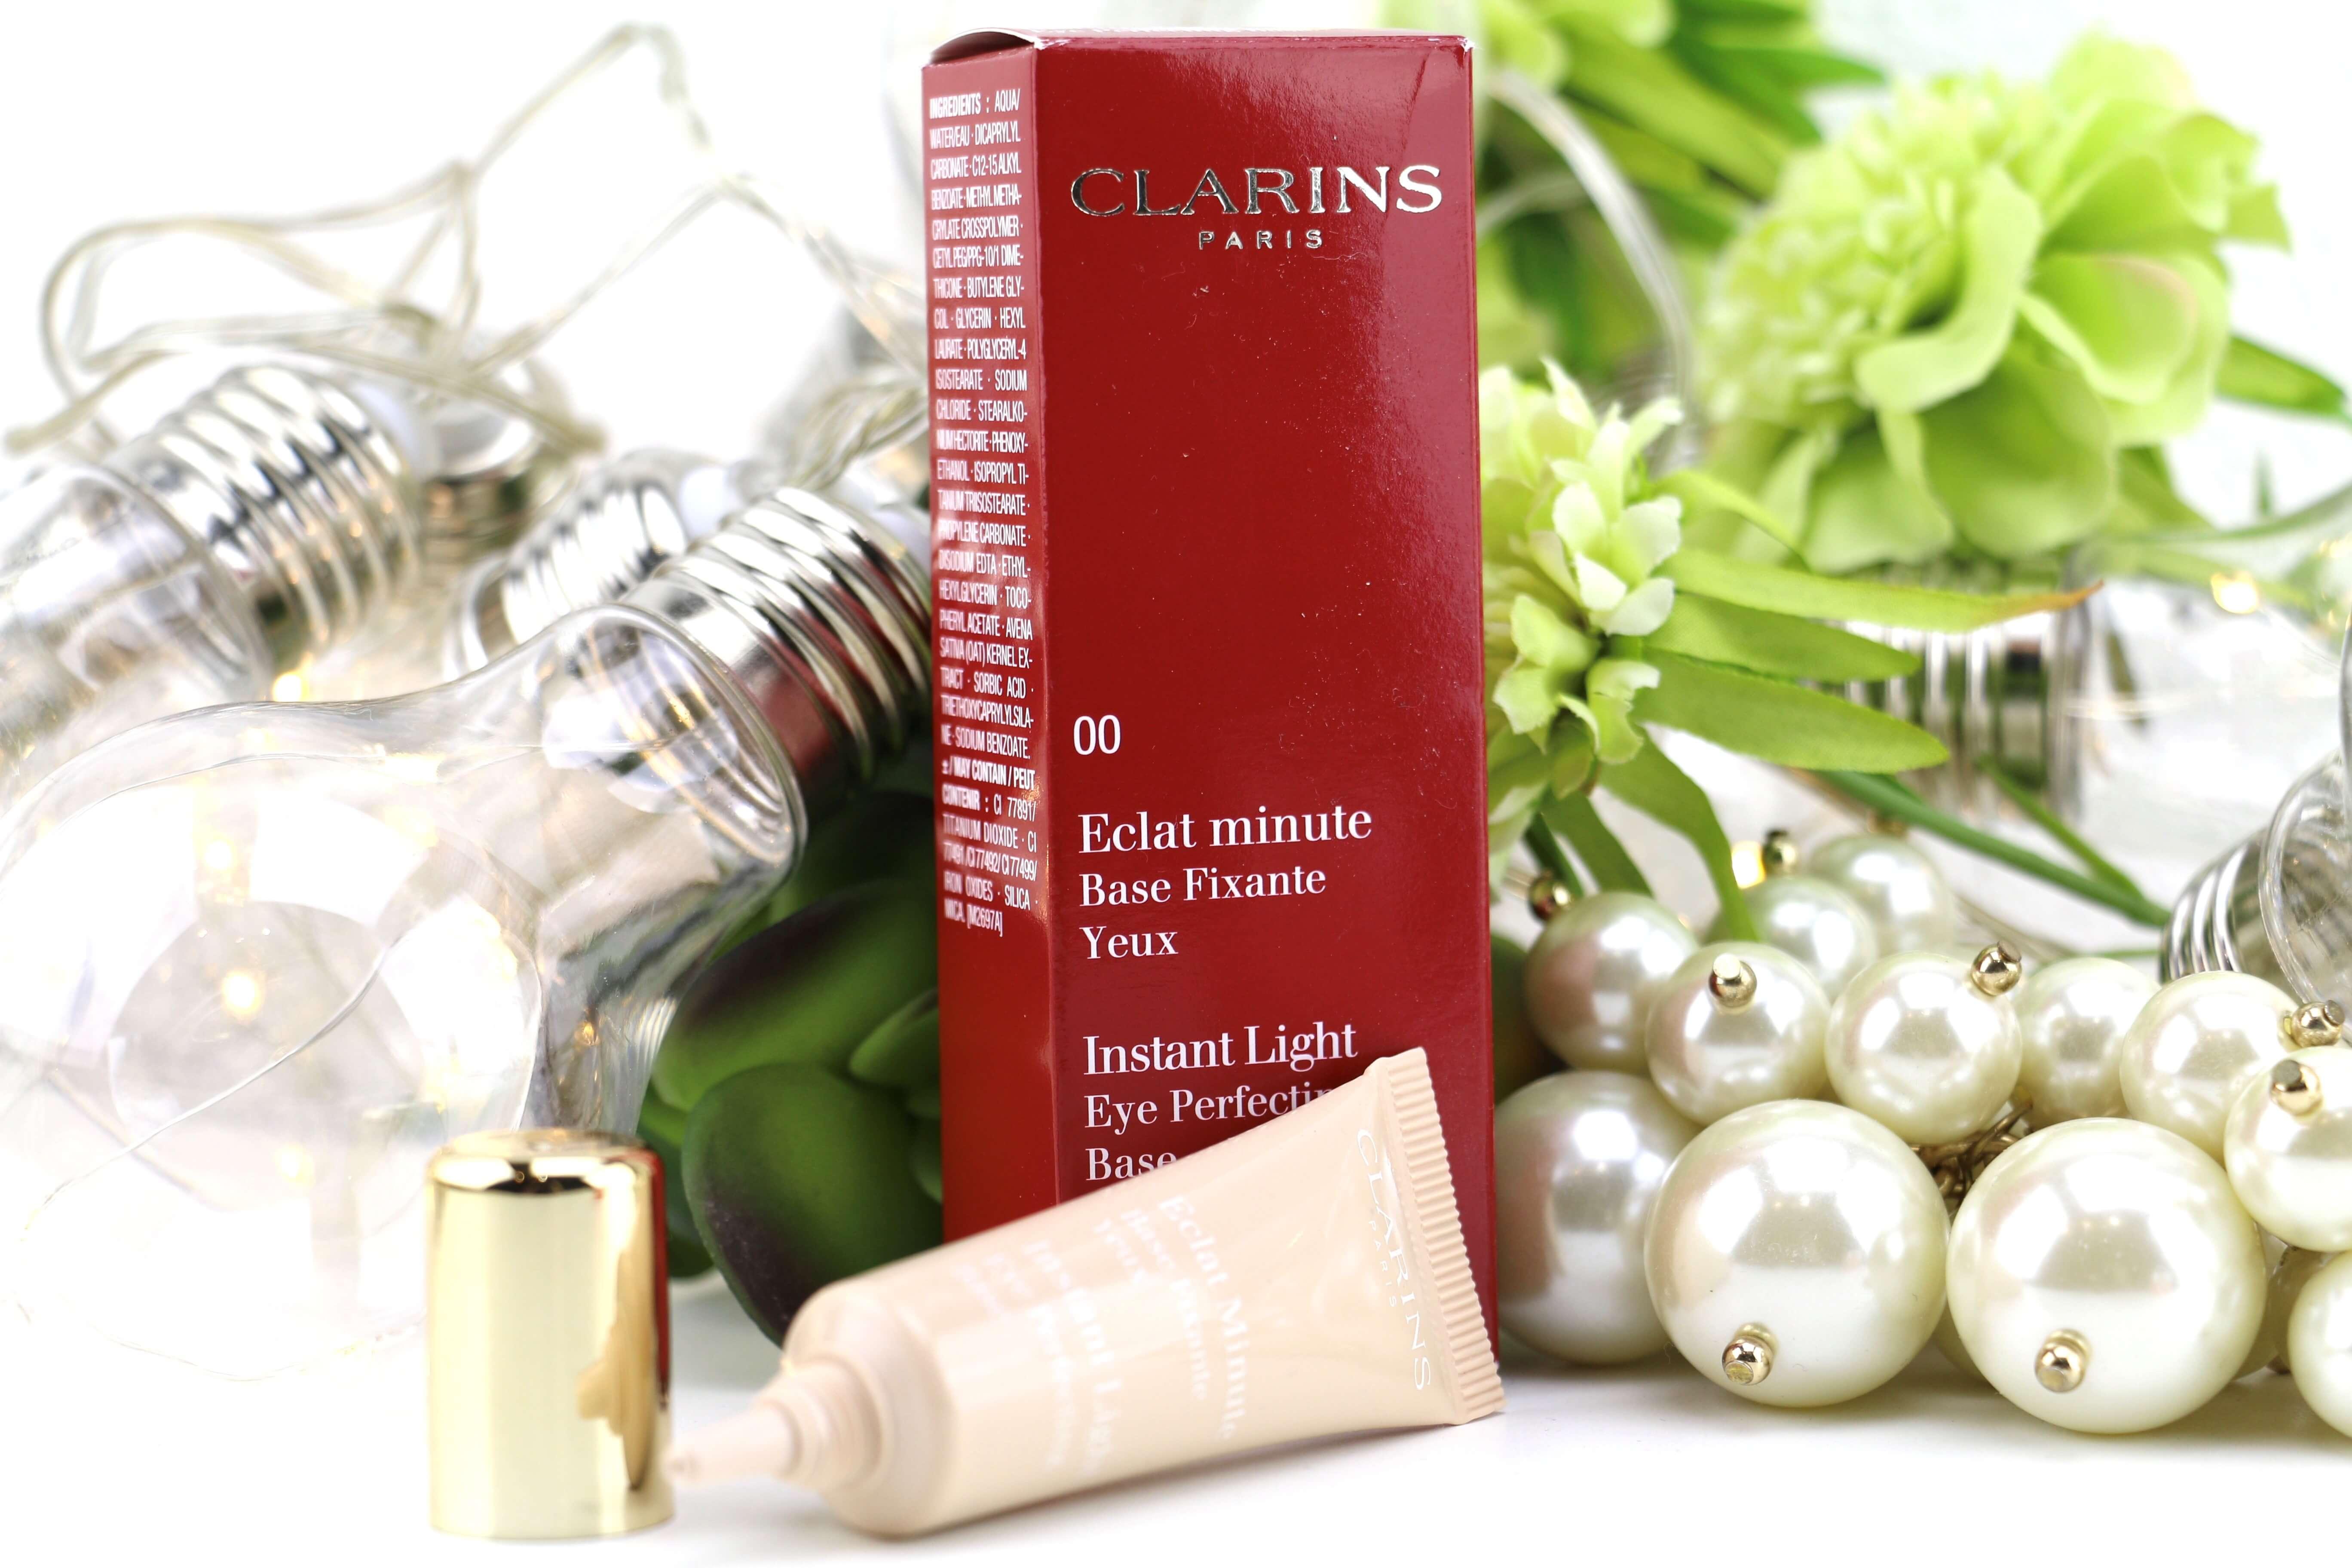 Clarins-Eclat-Minute-Eye-Perfecting-Base